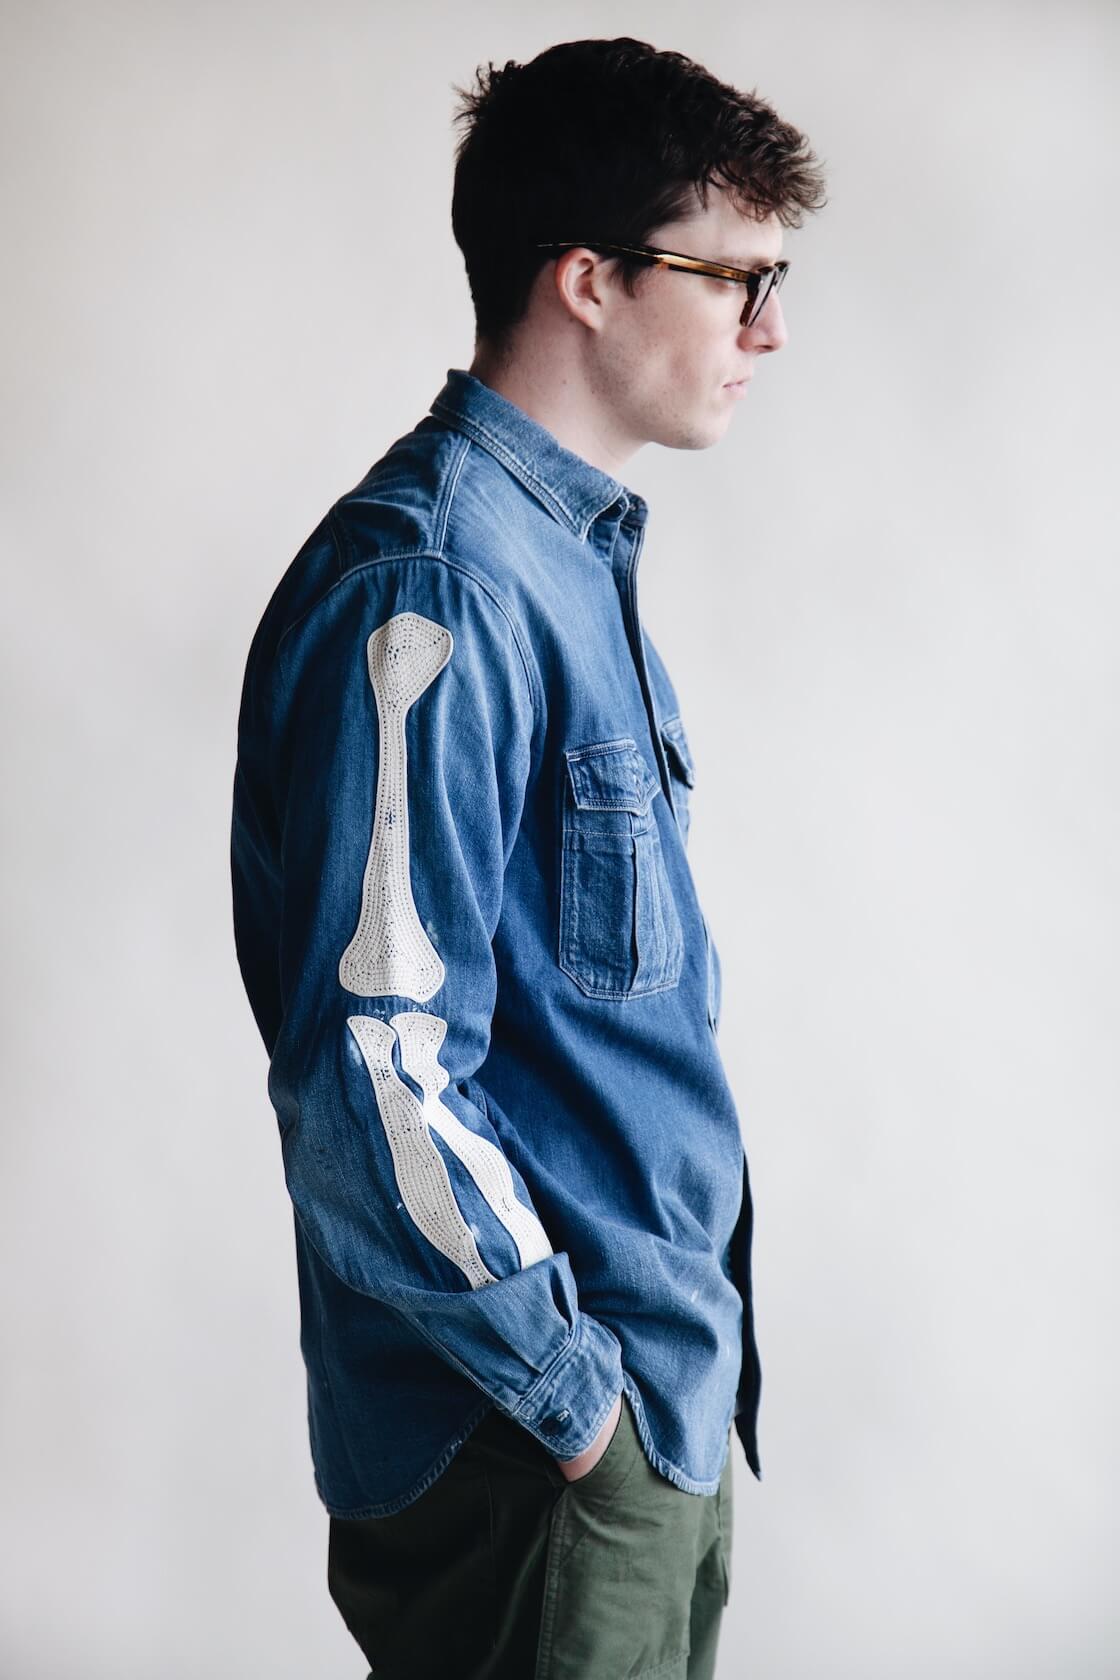 kapital work shirt with arm bones on body